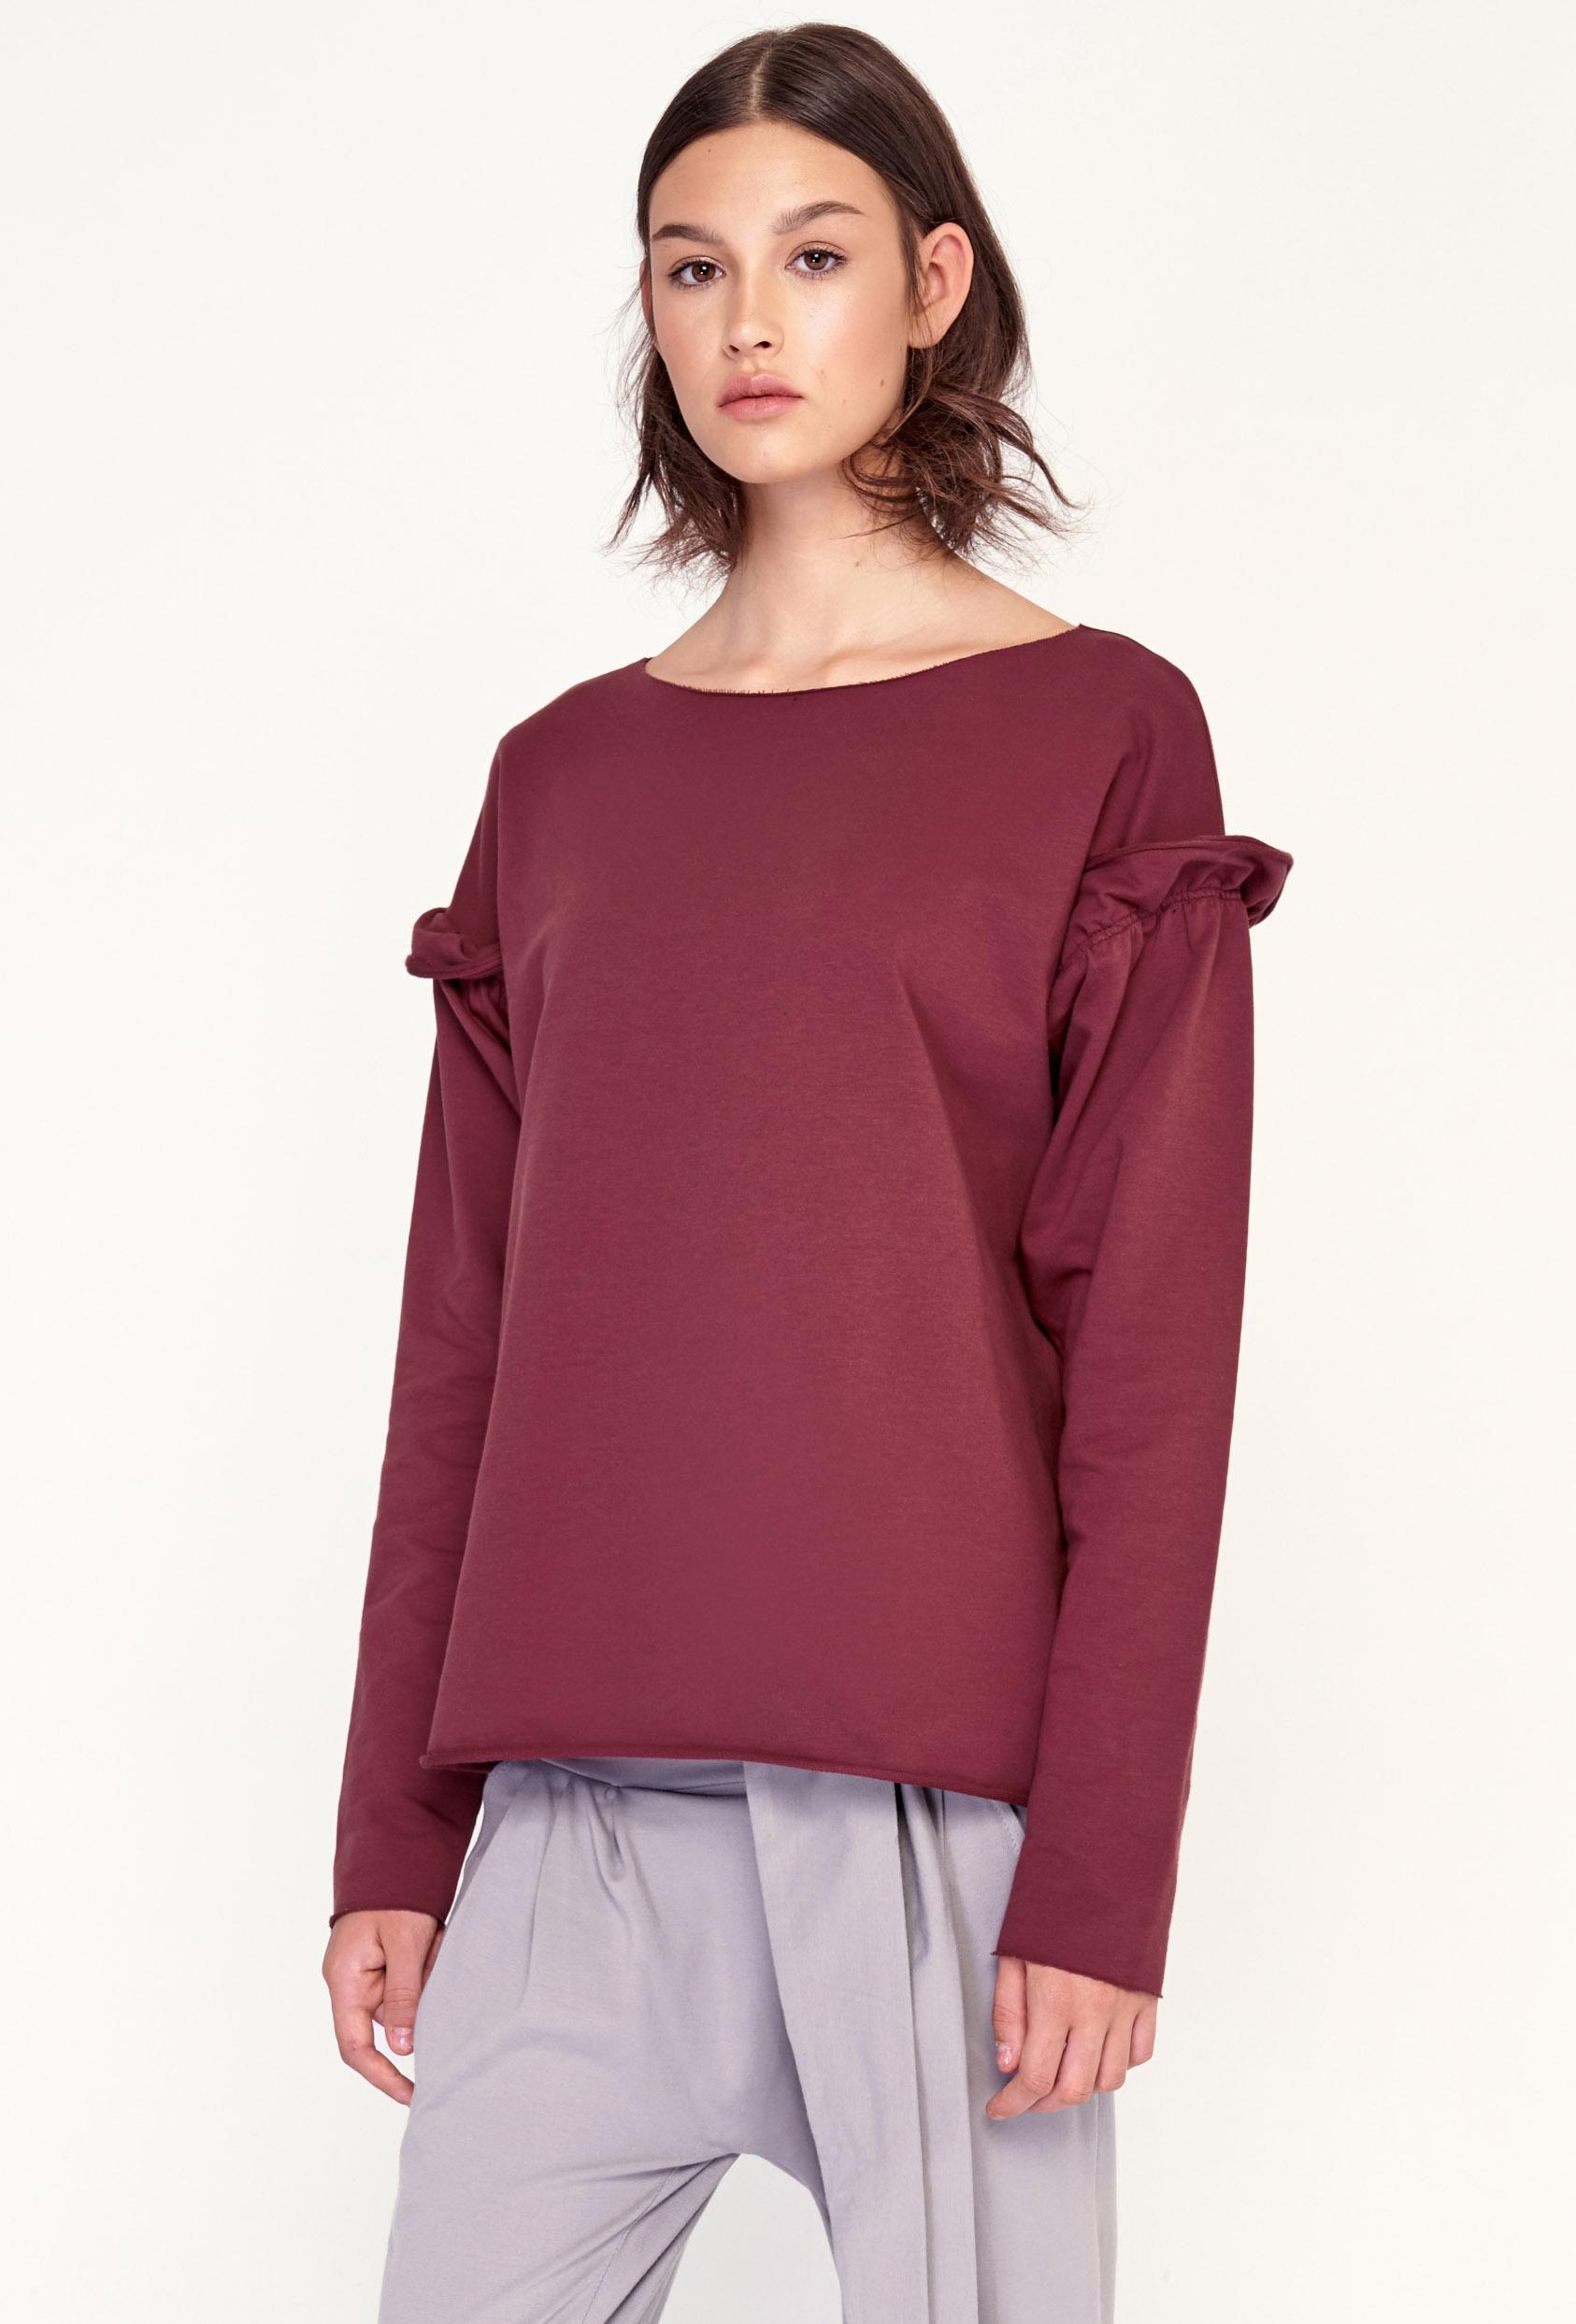 Bluza bez kaptura JOLENE BLOUSE czerwona_1